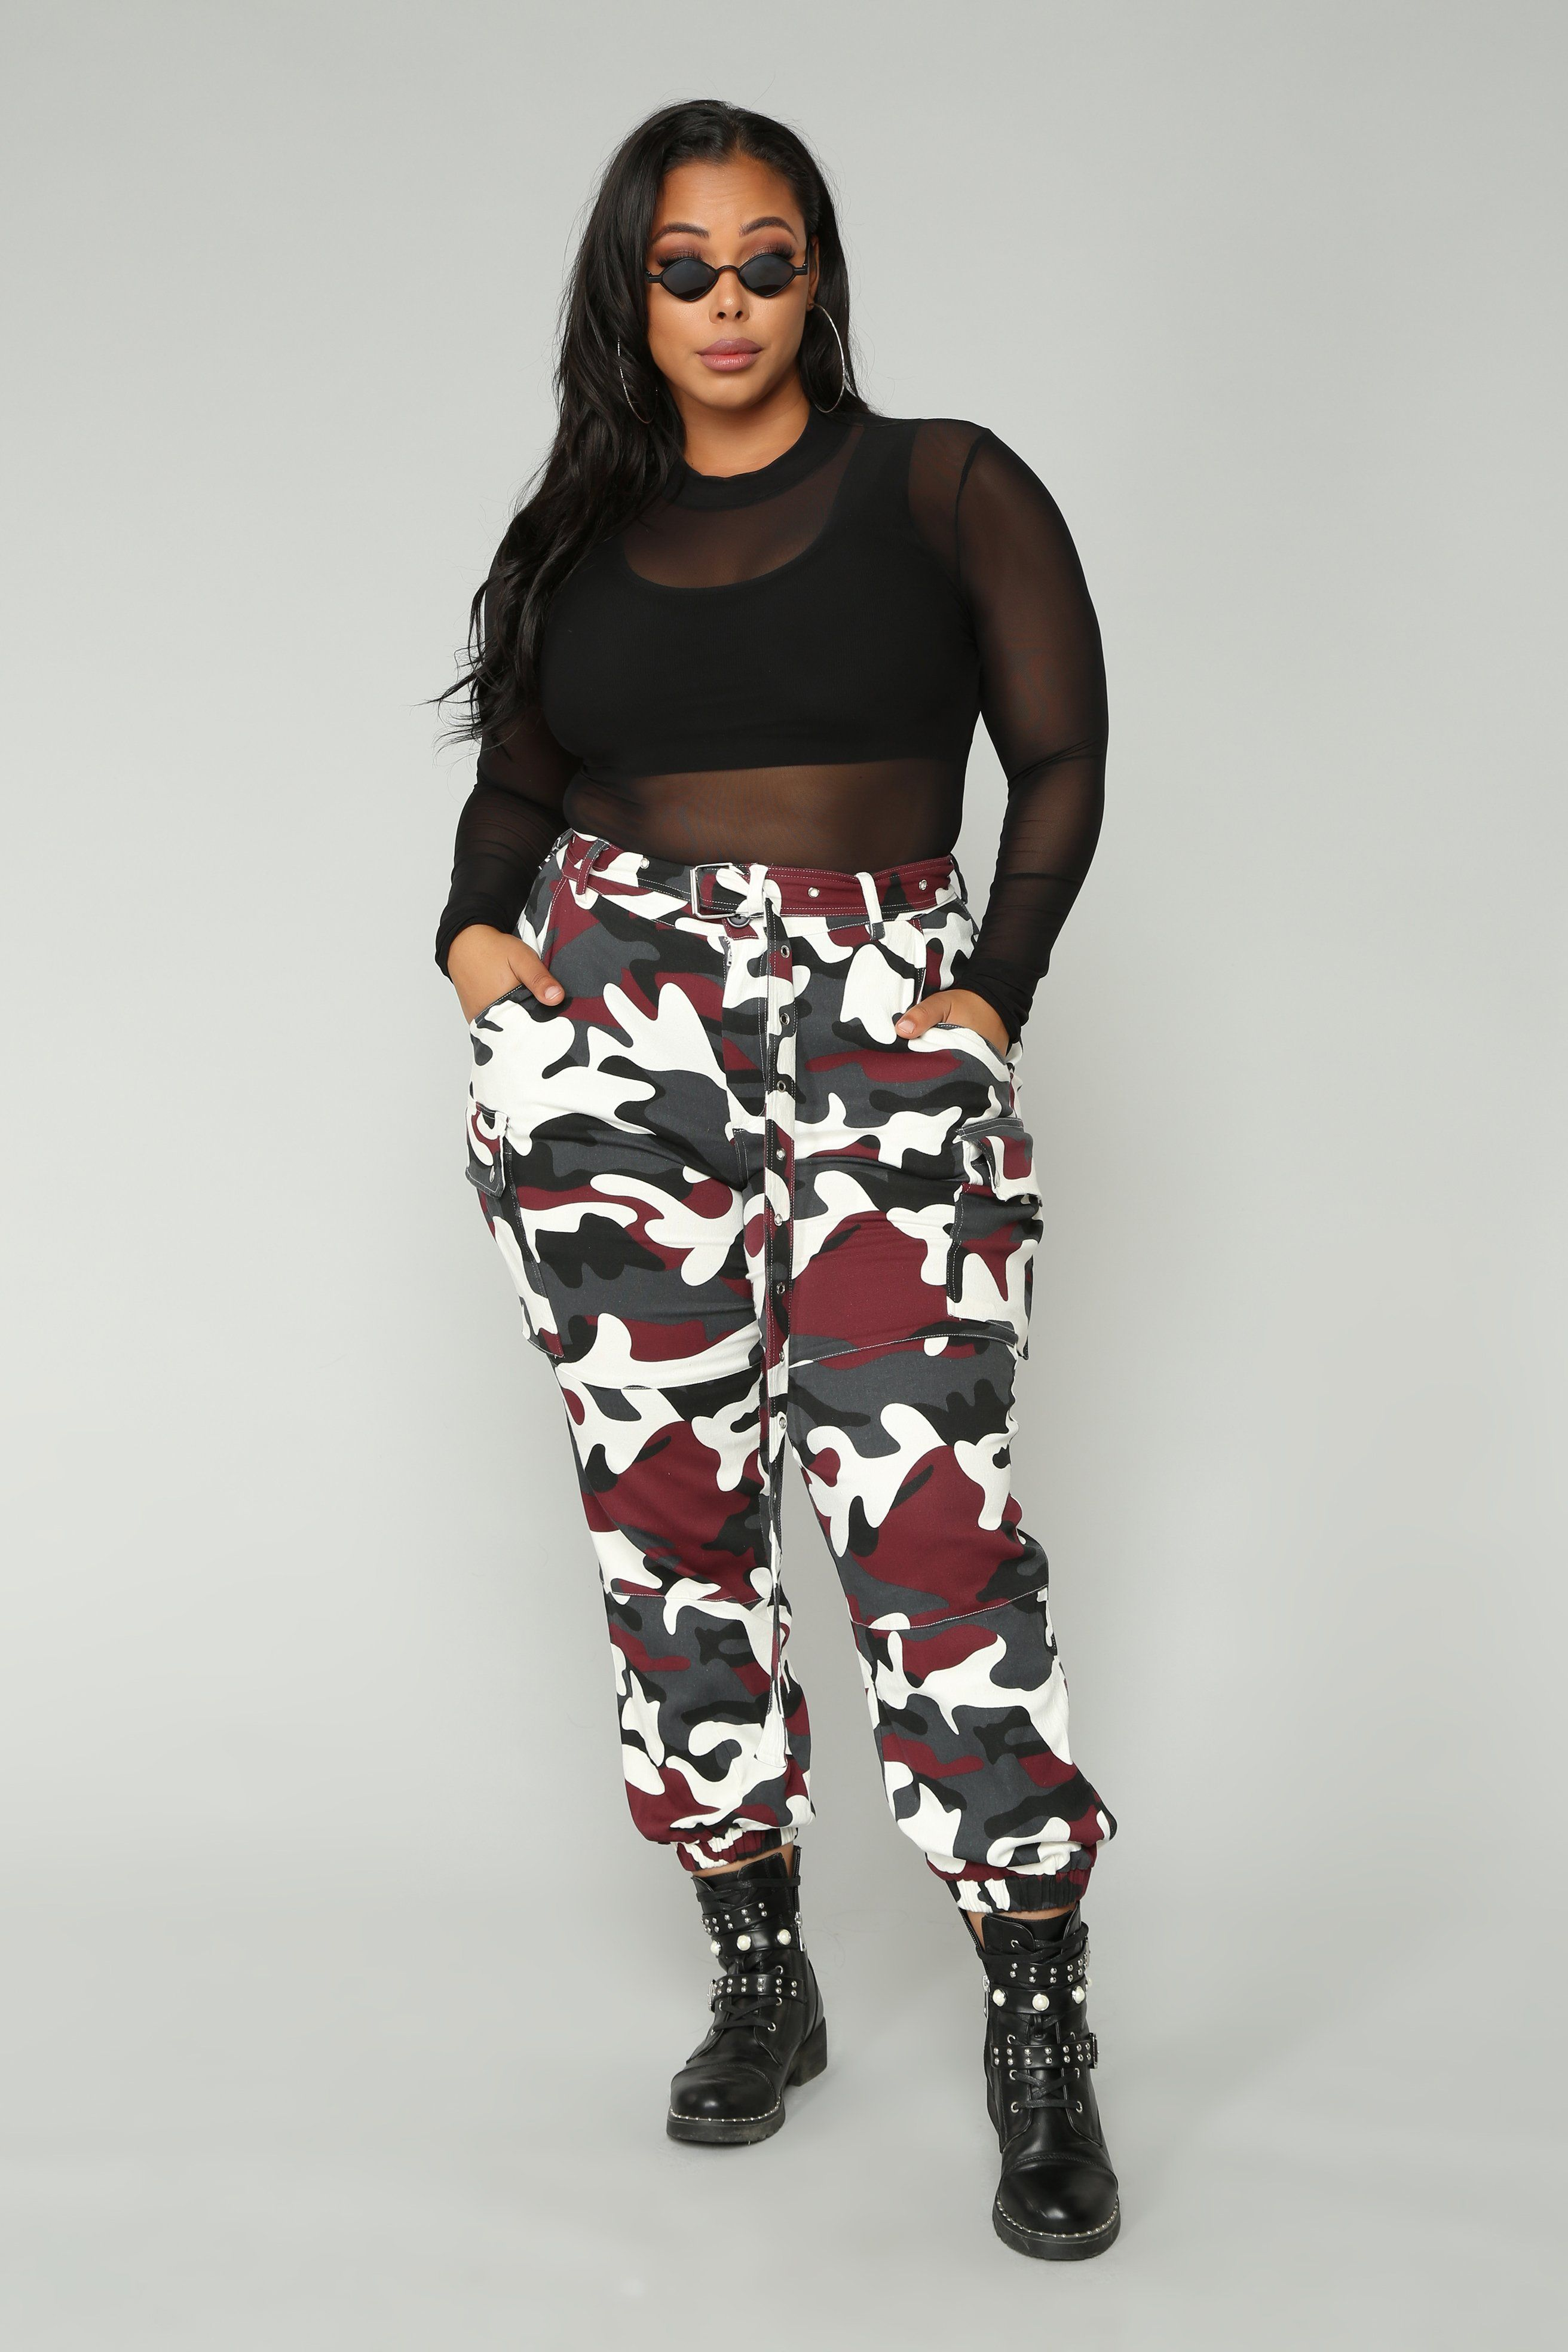 597d3948526 Plus Size Girls · Nova Nation Camo Joggers - Burgundy Camouflage Pants